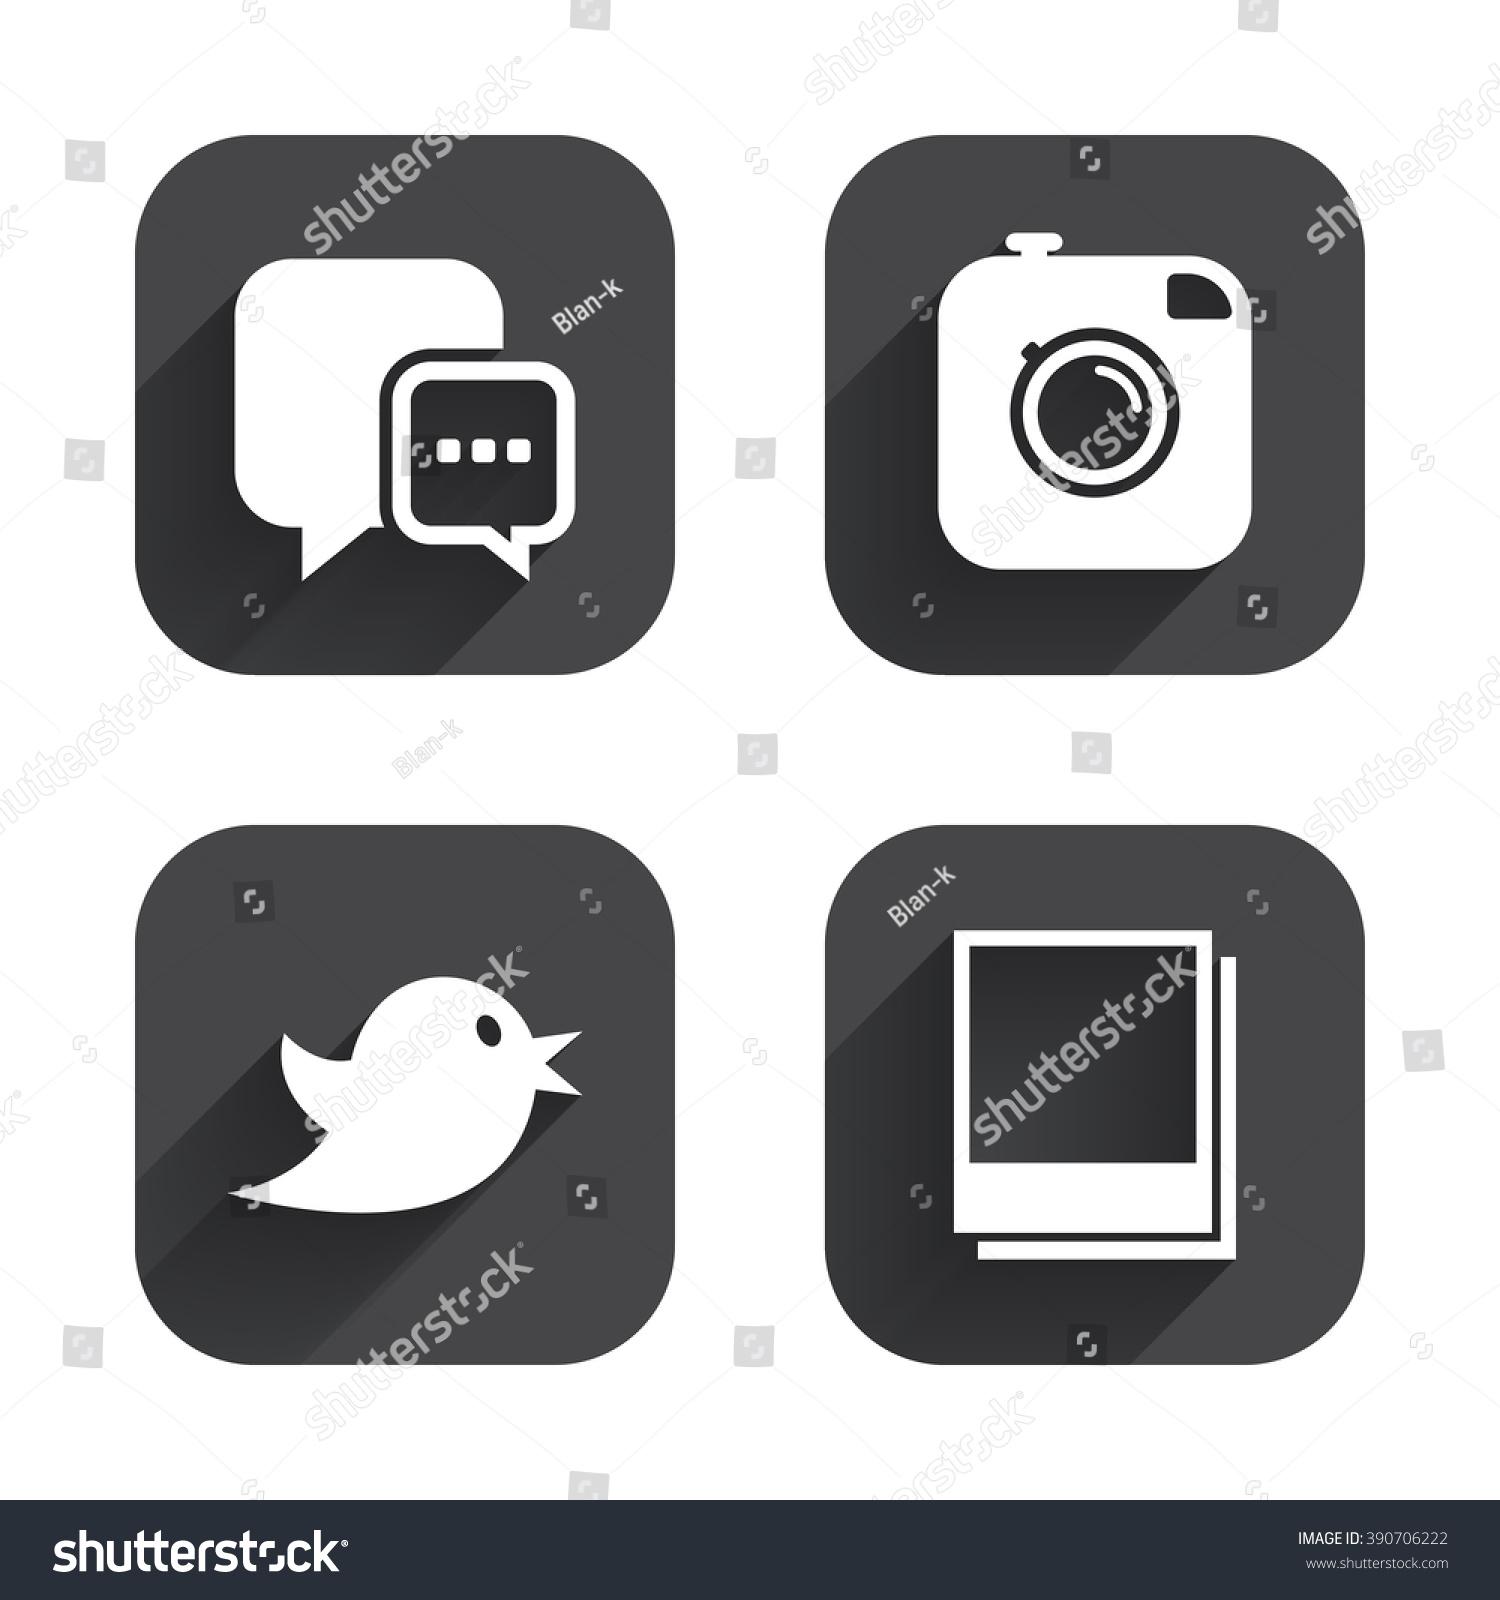 Social media icons chat speech bubble stock illustration 390706222 chat speech bubble symbol hipster photo camera sign empty photo buycottarizona Gallery